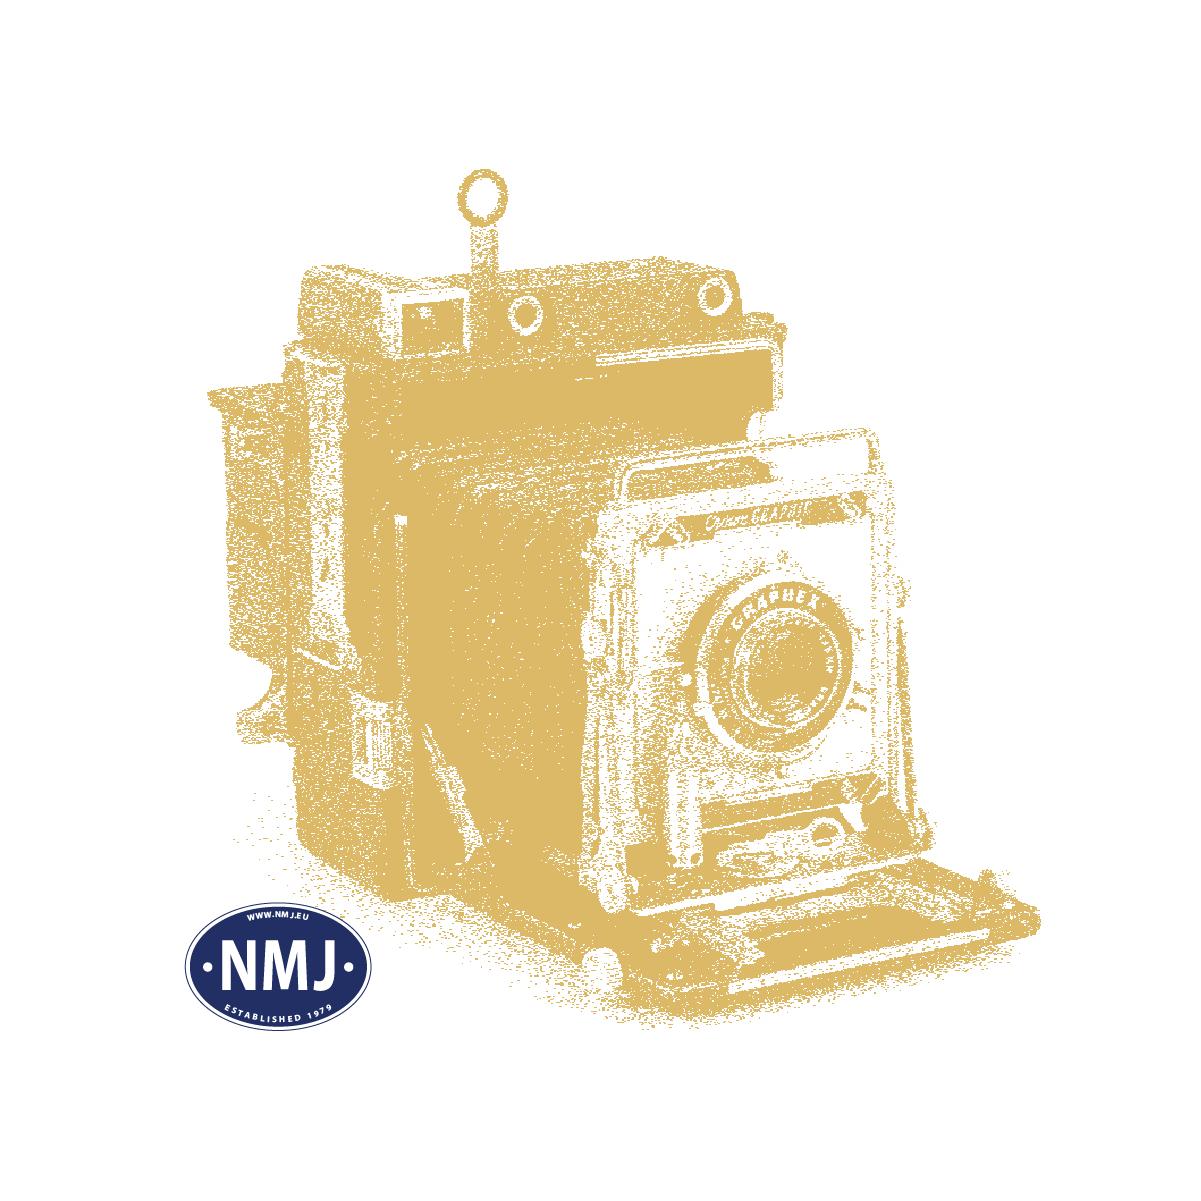 MRHMS-233 - Mr. Mark Softer Neo, 40 ml